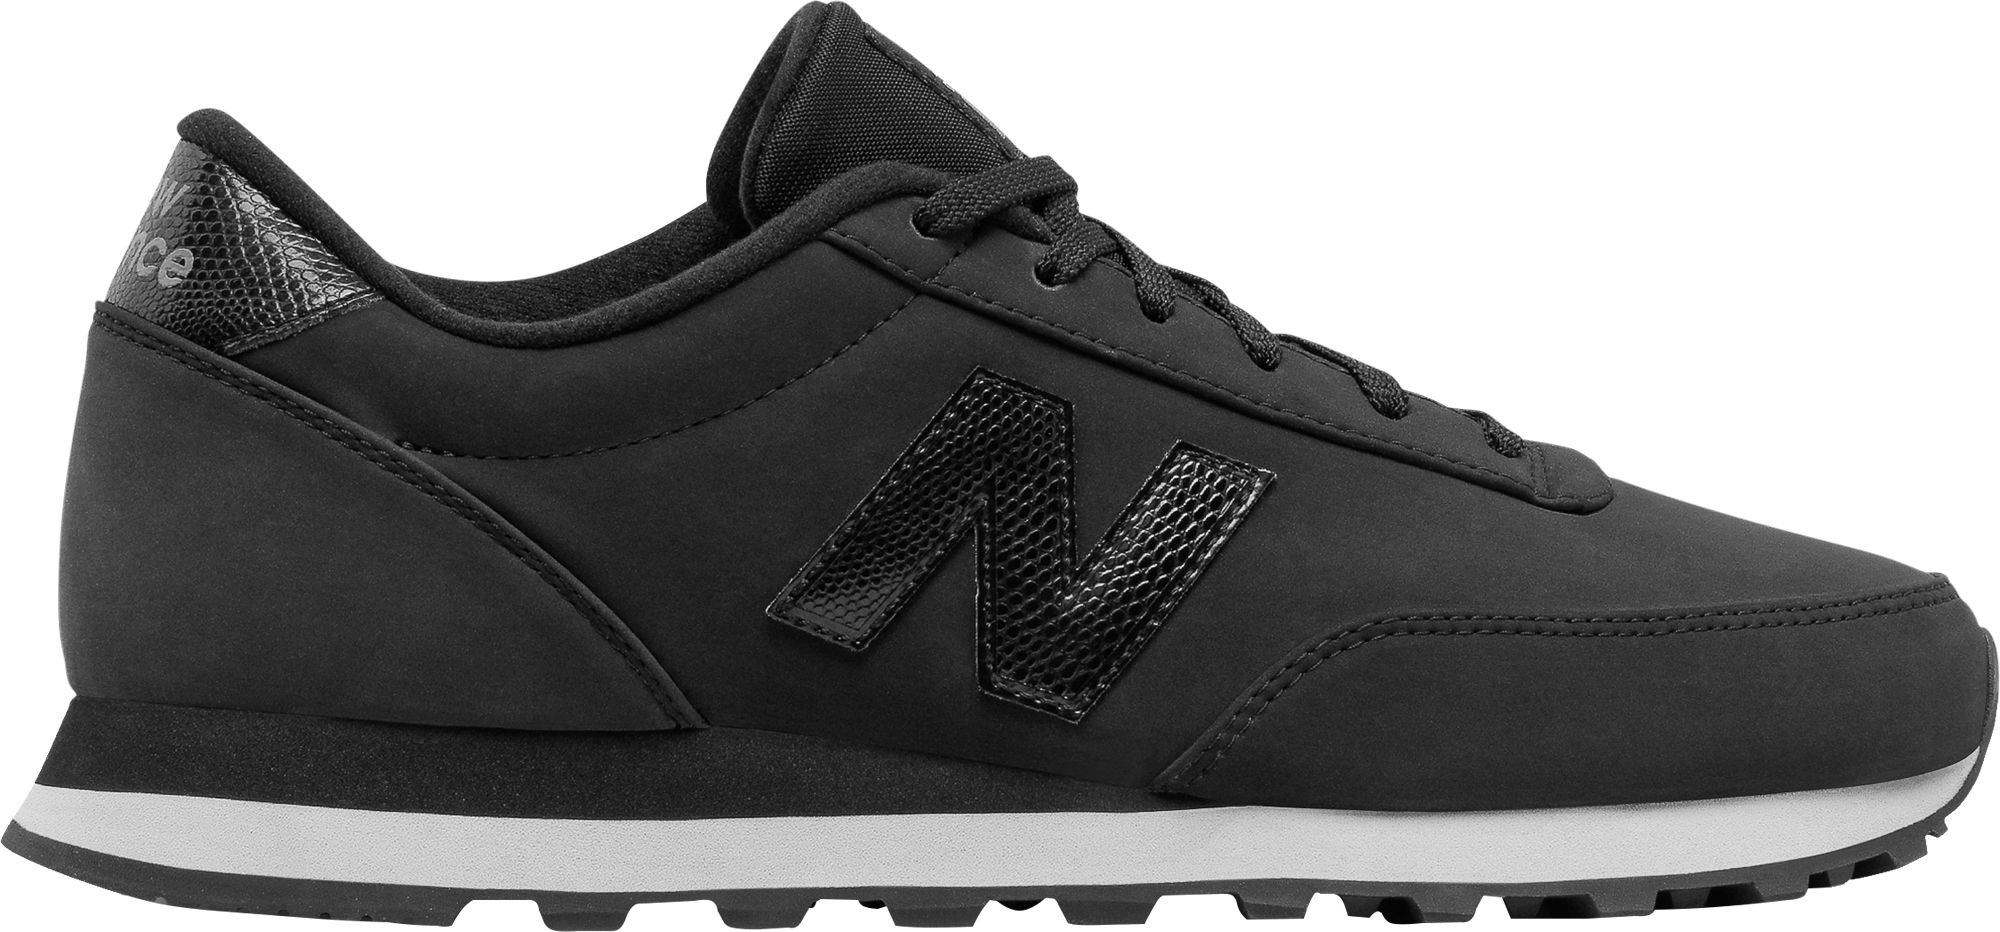 black new balance 501 sneaker